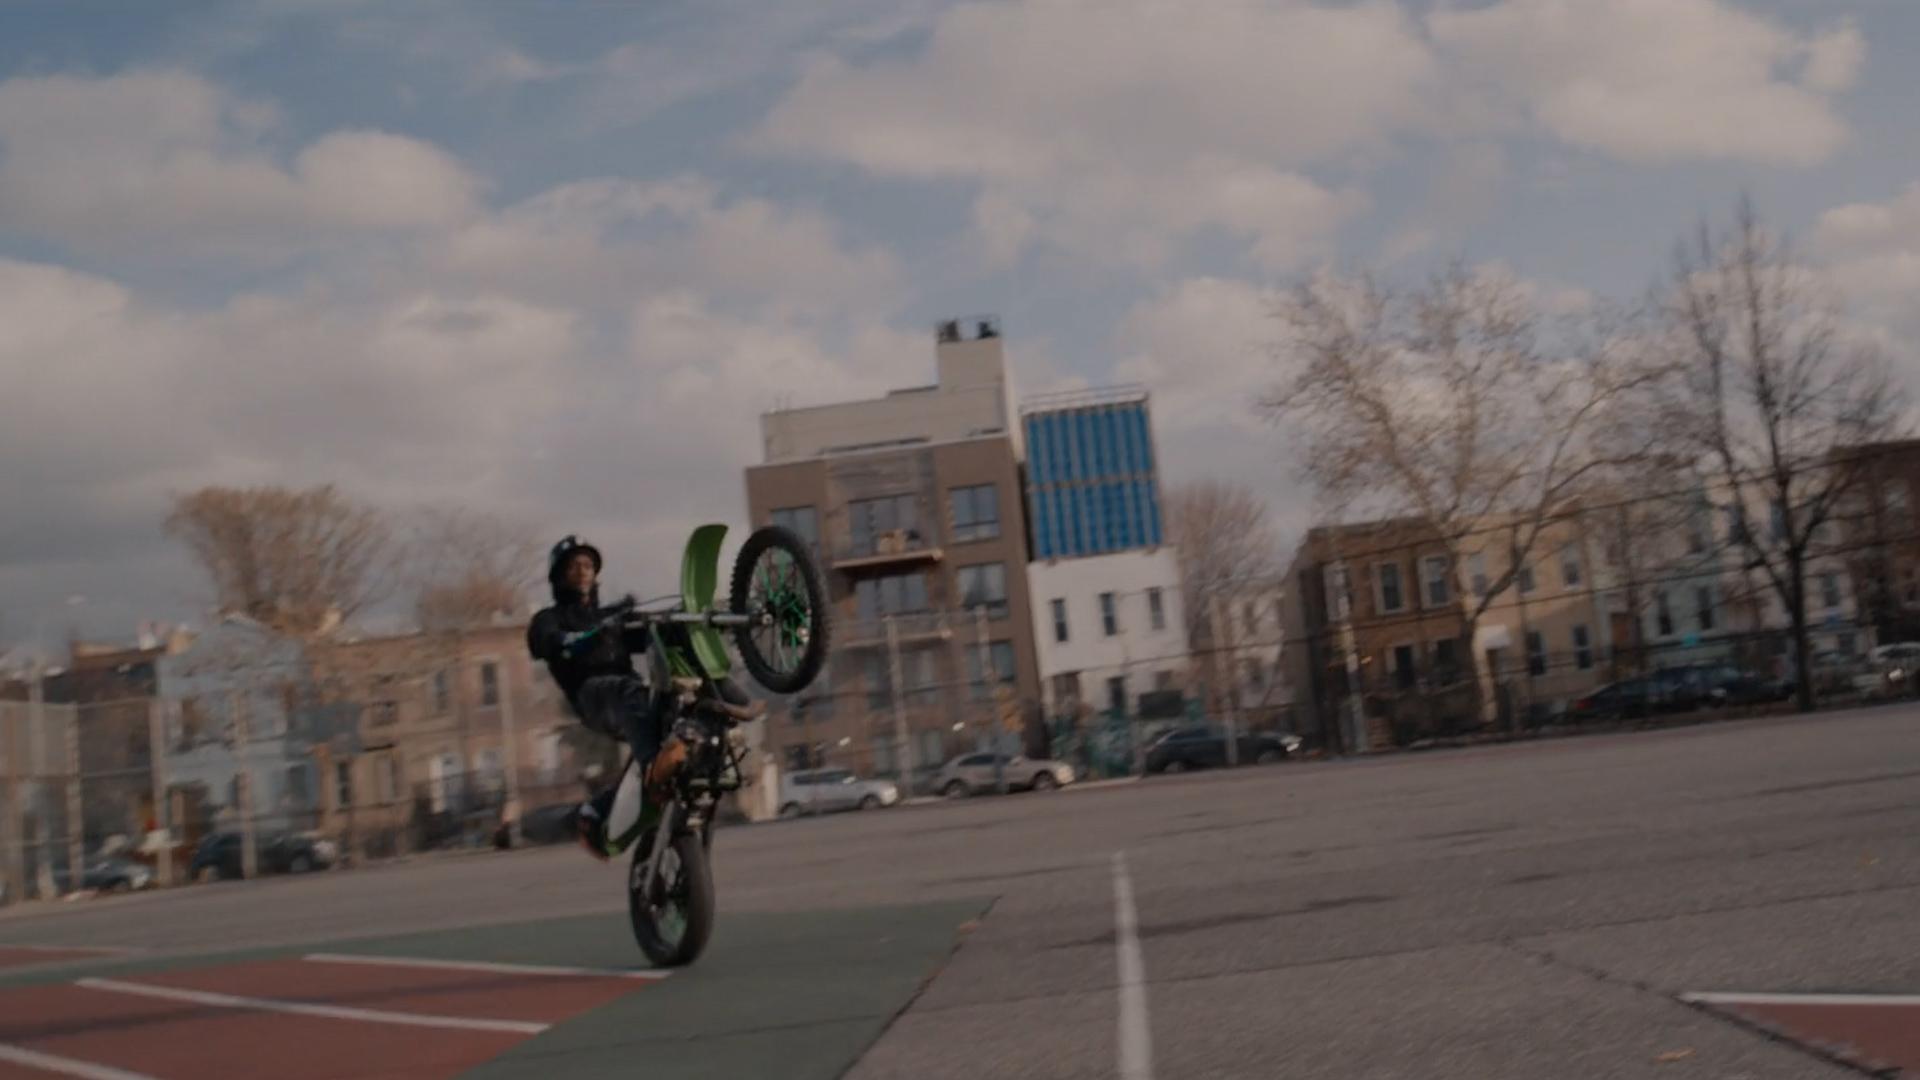 BikesUpGunsDown